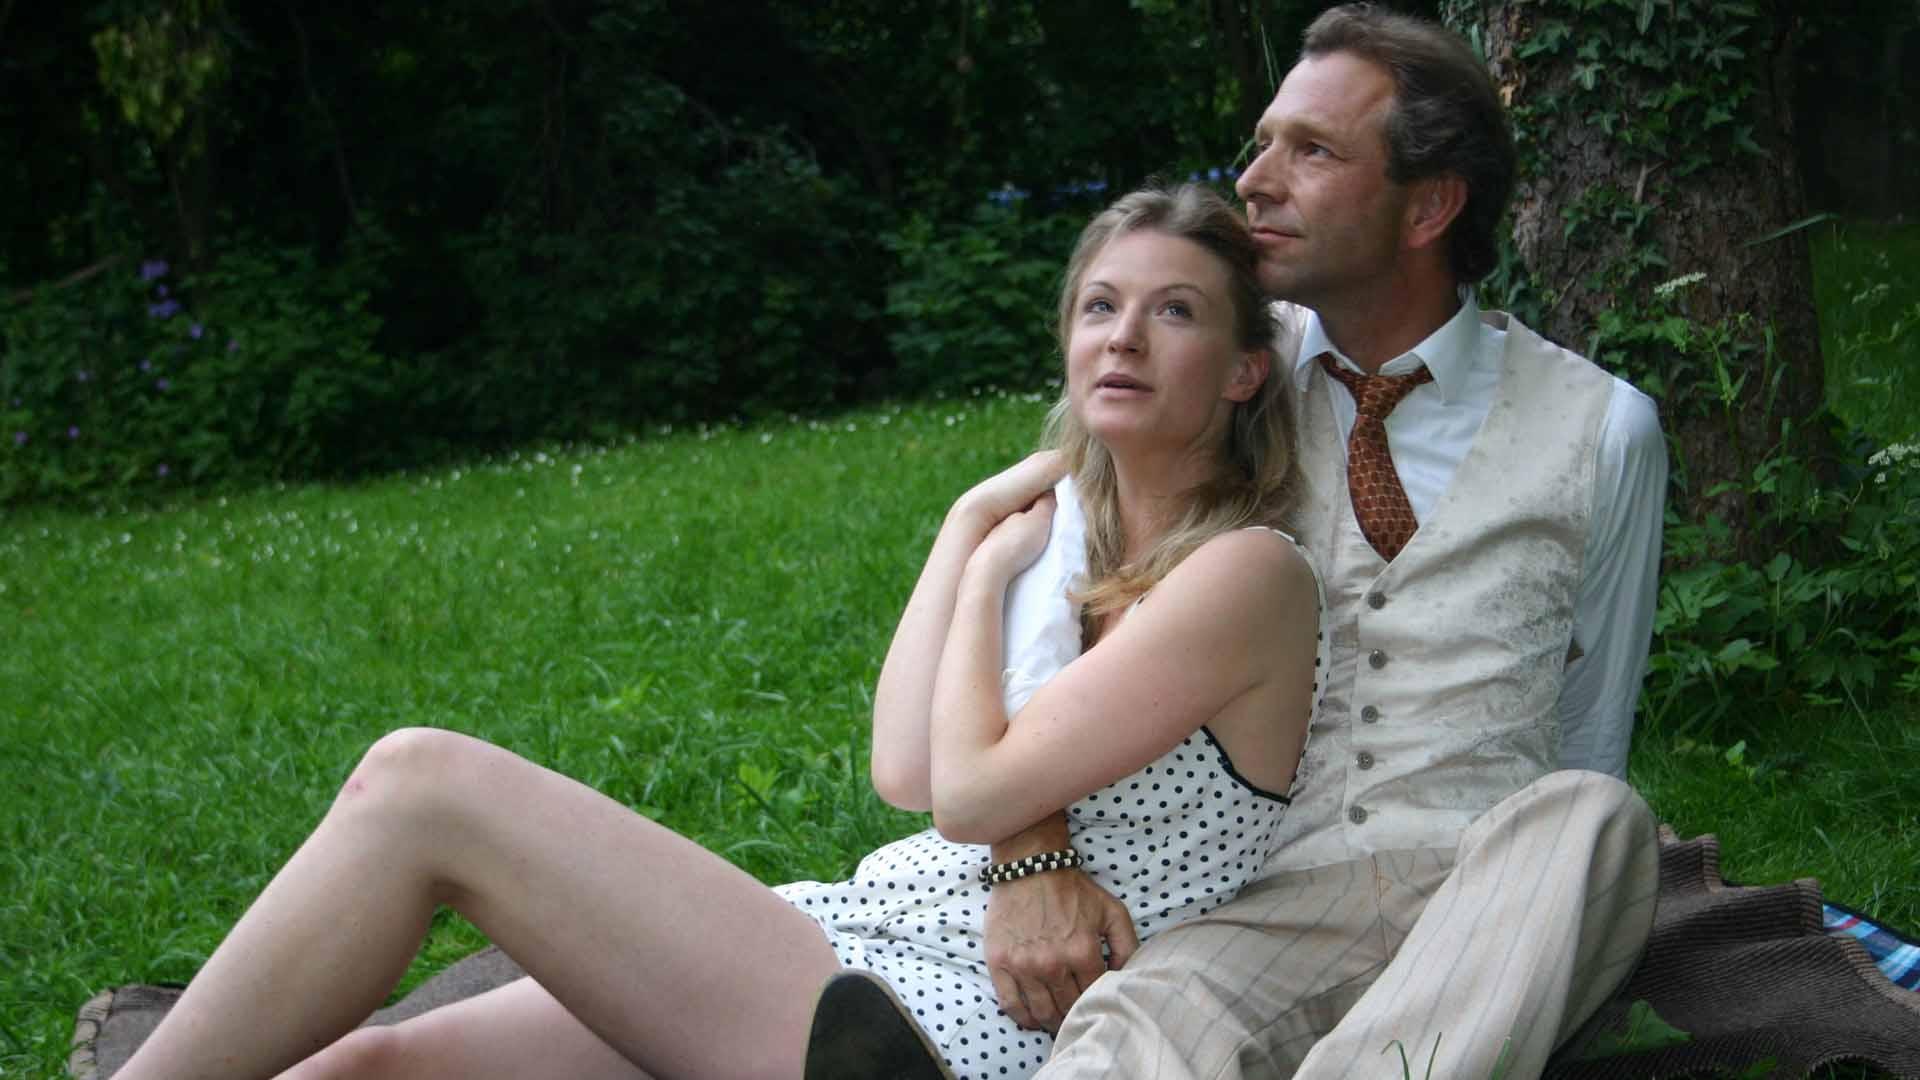 Dating seite aus giehbl - Reiche frau sucht mann ch